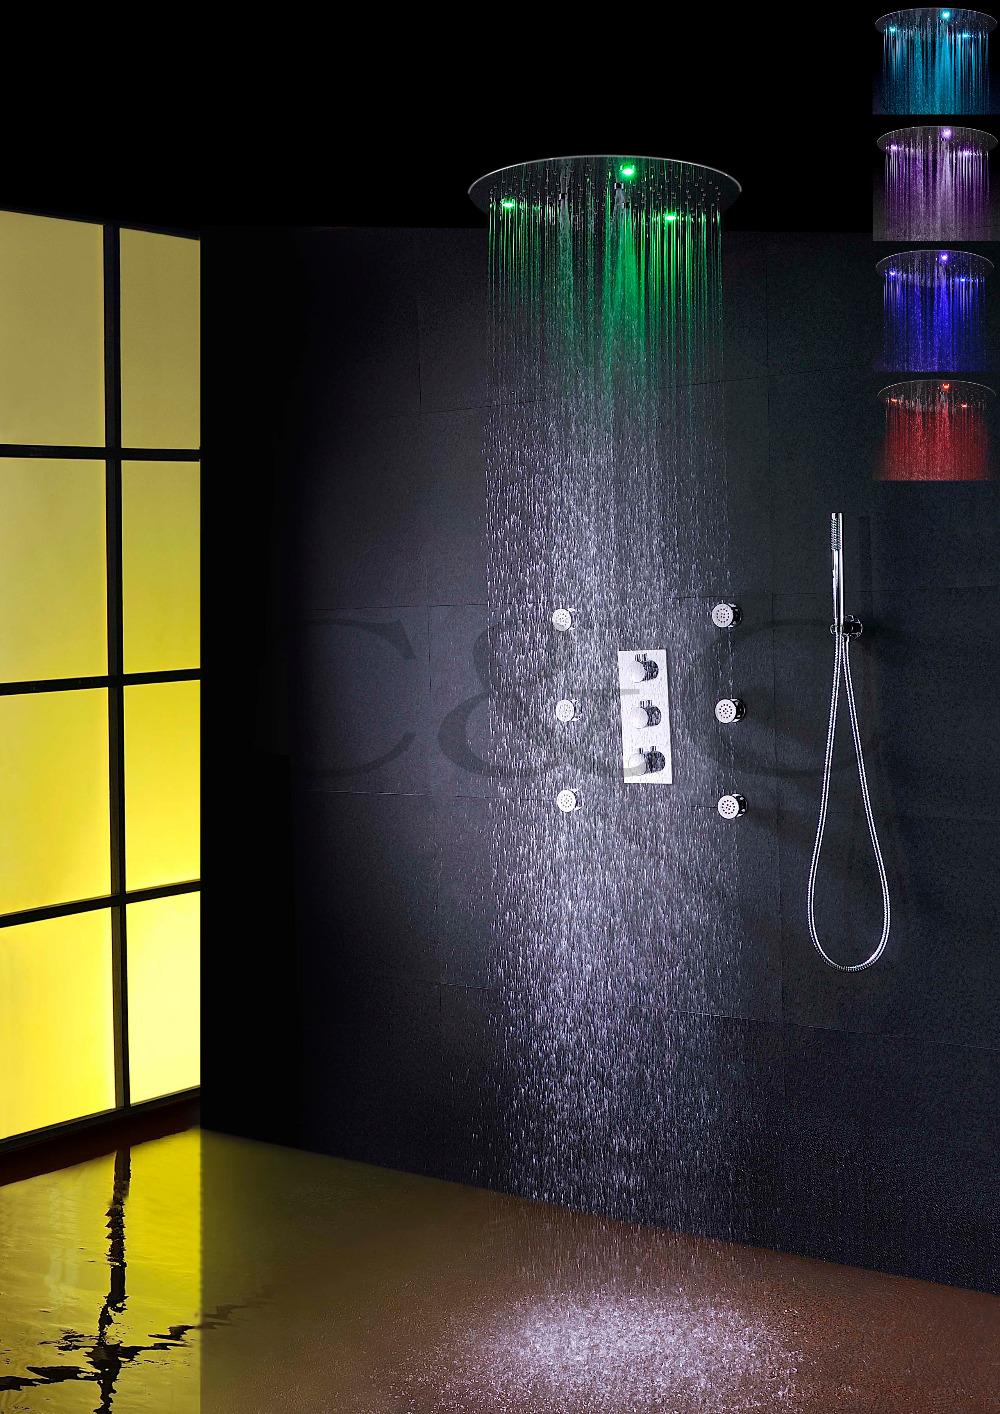 Round Thermostatic Bathroom Shower Faucet Set 20 Inch 7 Colors 100V~240V AC Spraying Rain LED Head - C&C Sanitary Ware Co., Ltd. store